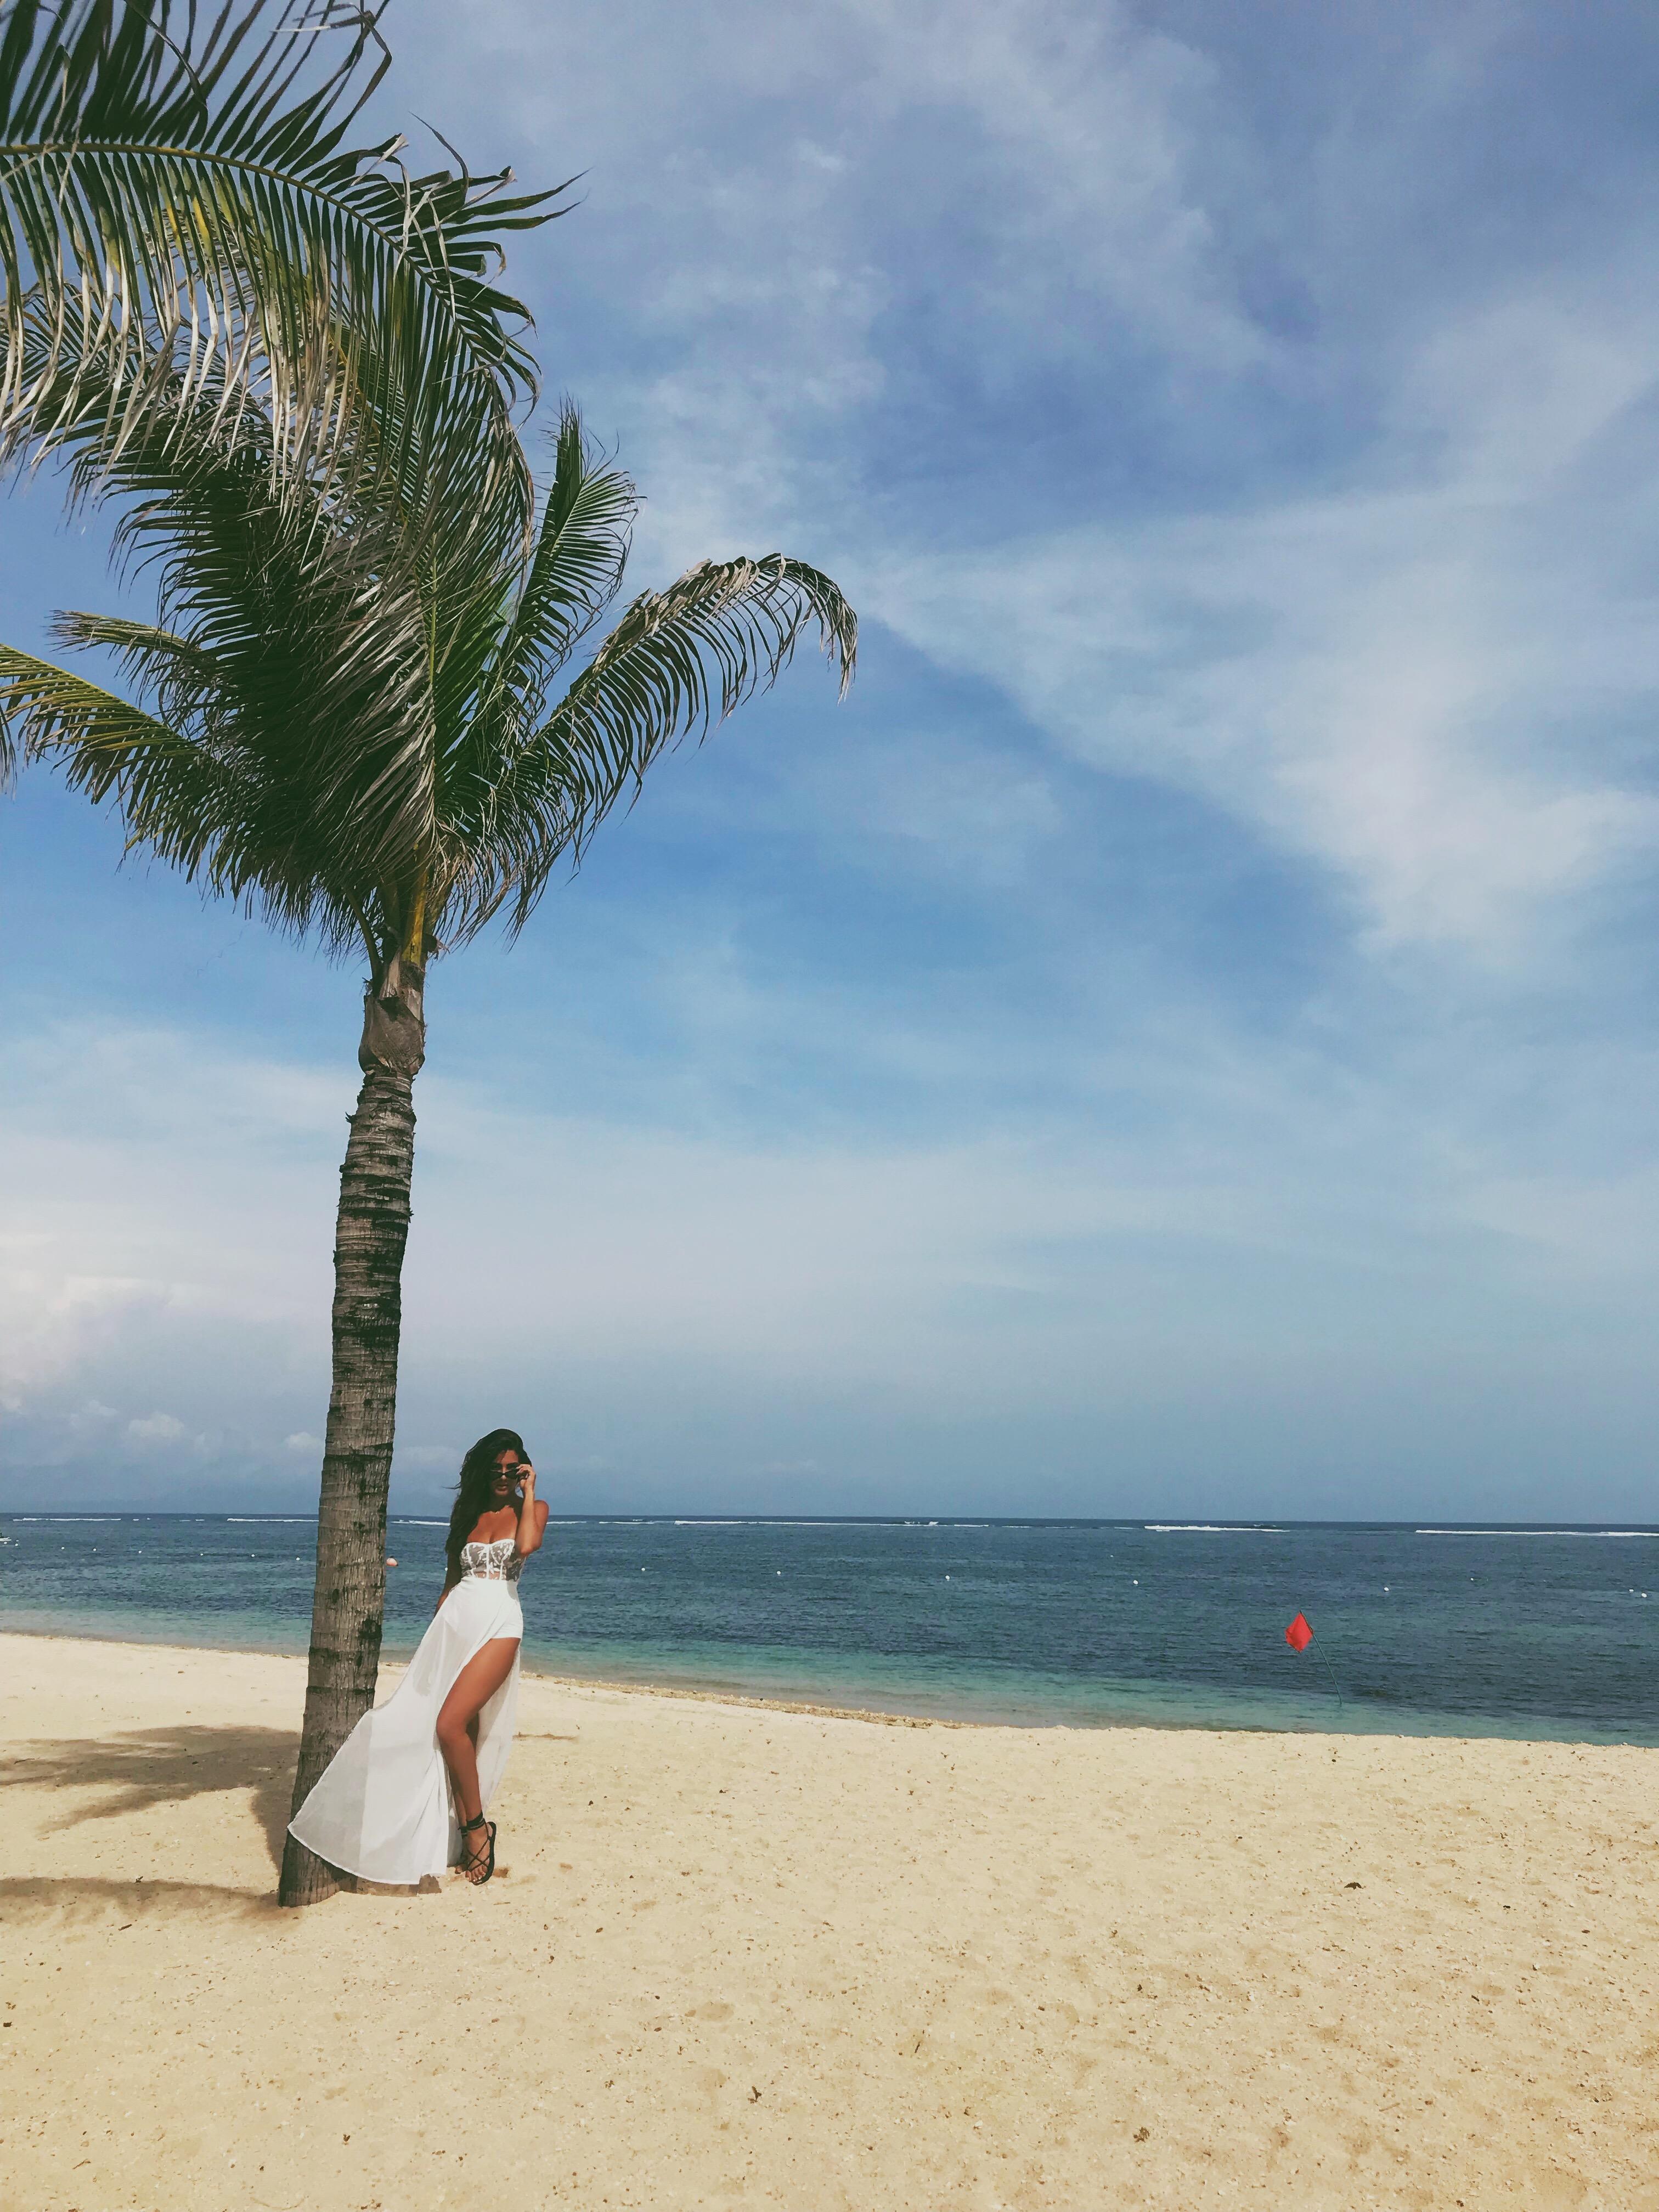 The Denver Look | Travel Blogger in Bali